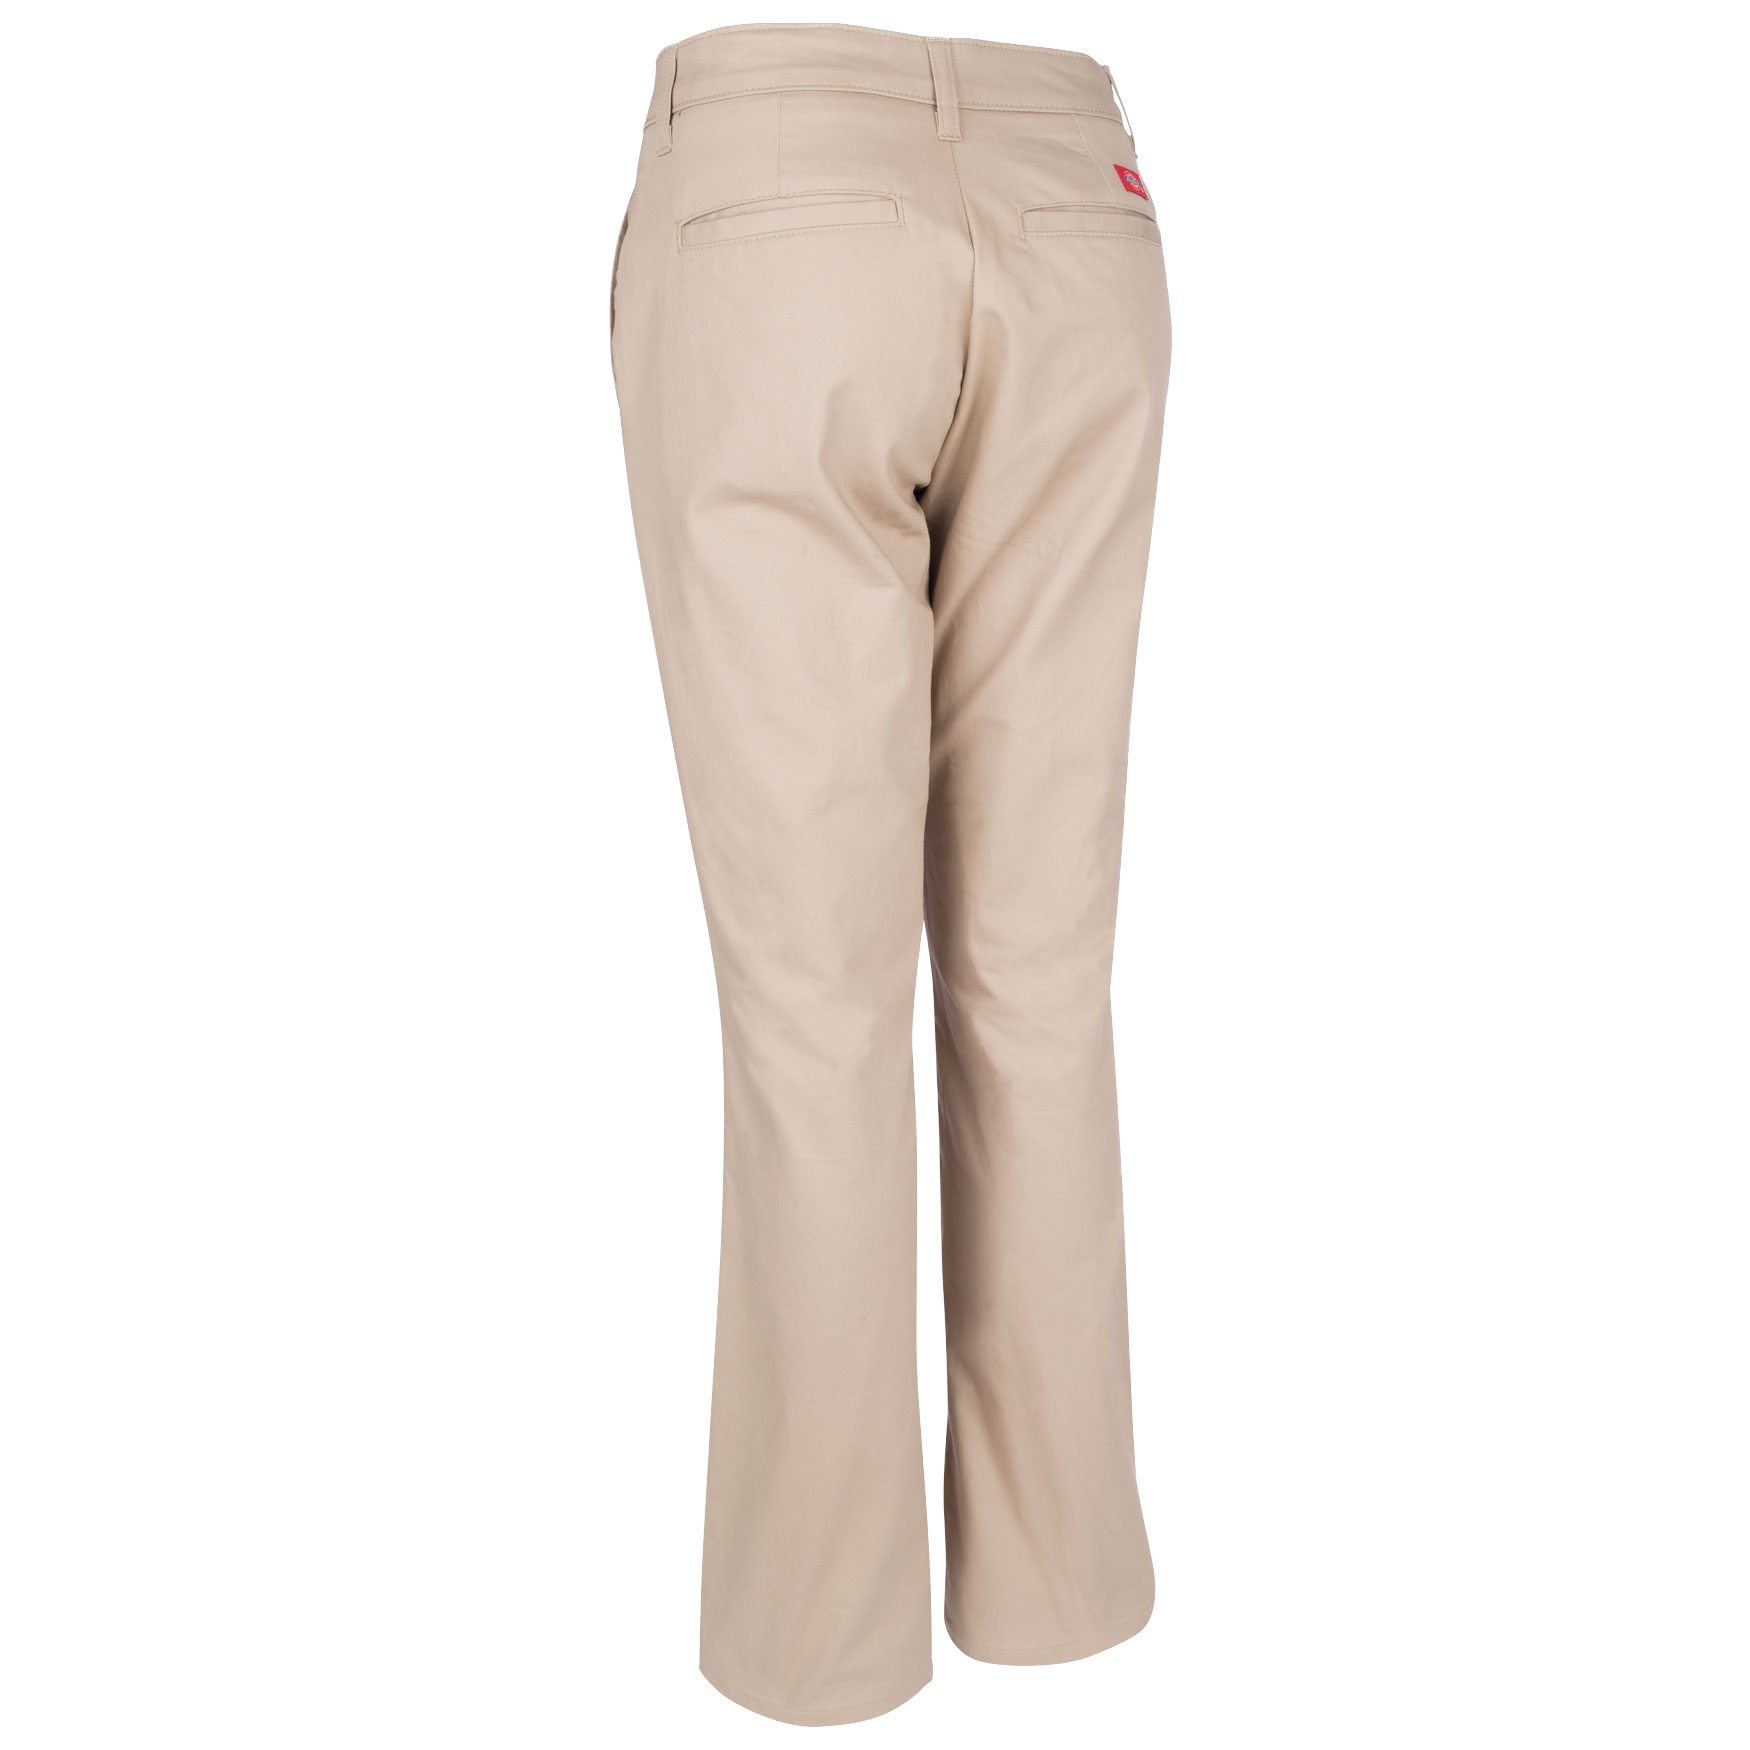 Women's Stretch Twill Pants